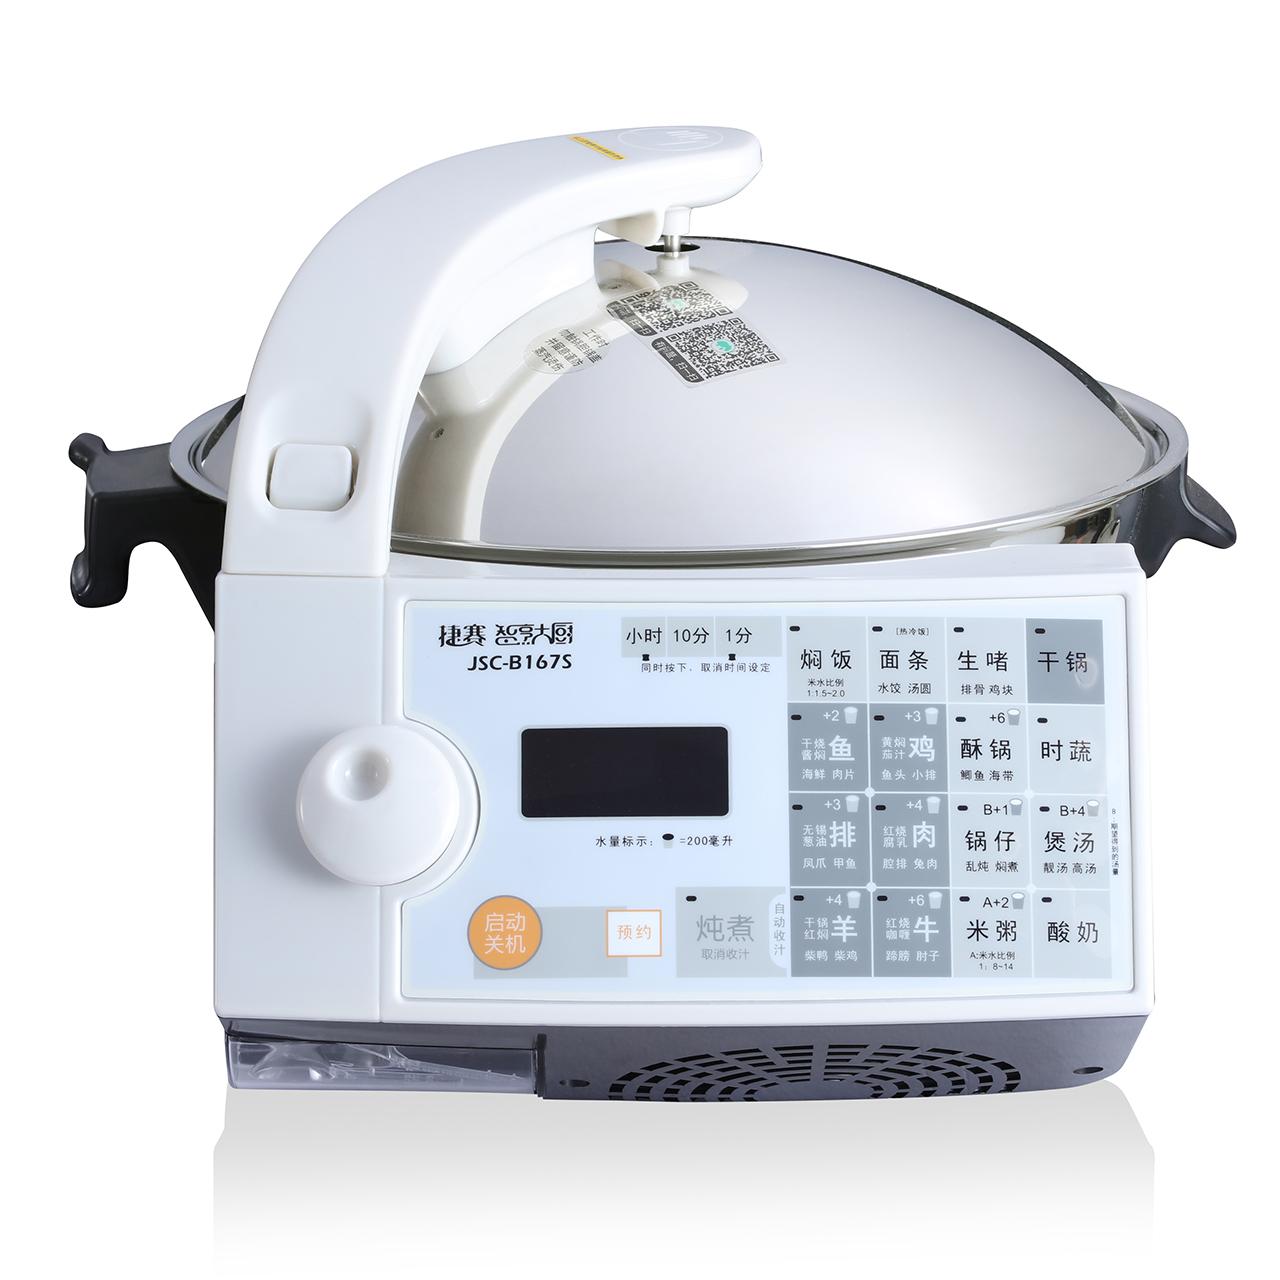 Gemside捷赛全自动烹饪锅升级版B167S智能炒菜机 无油烟可预约